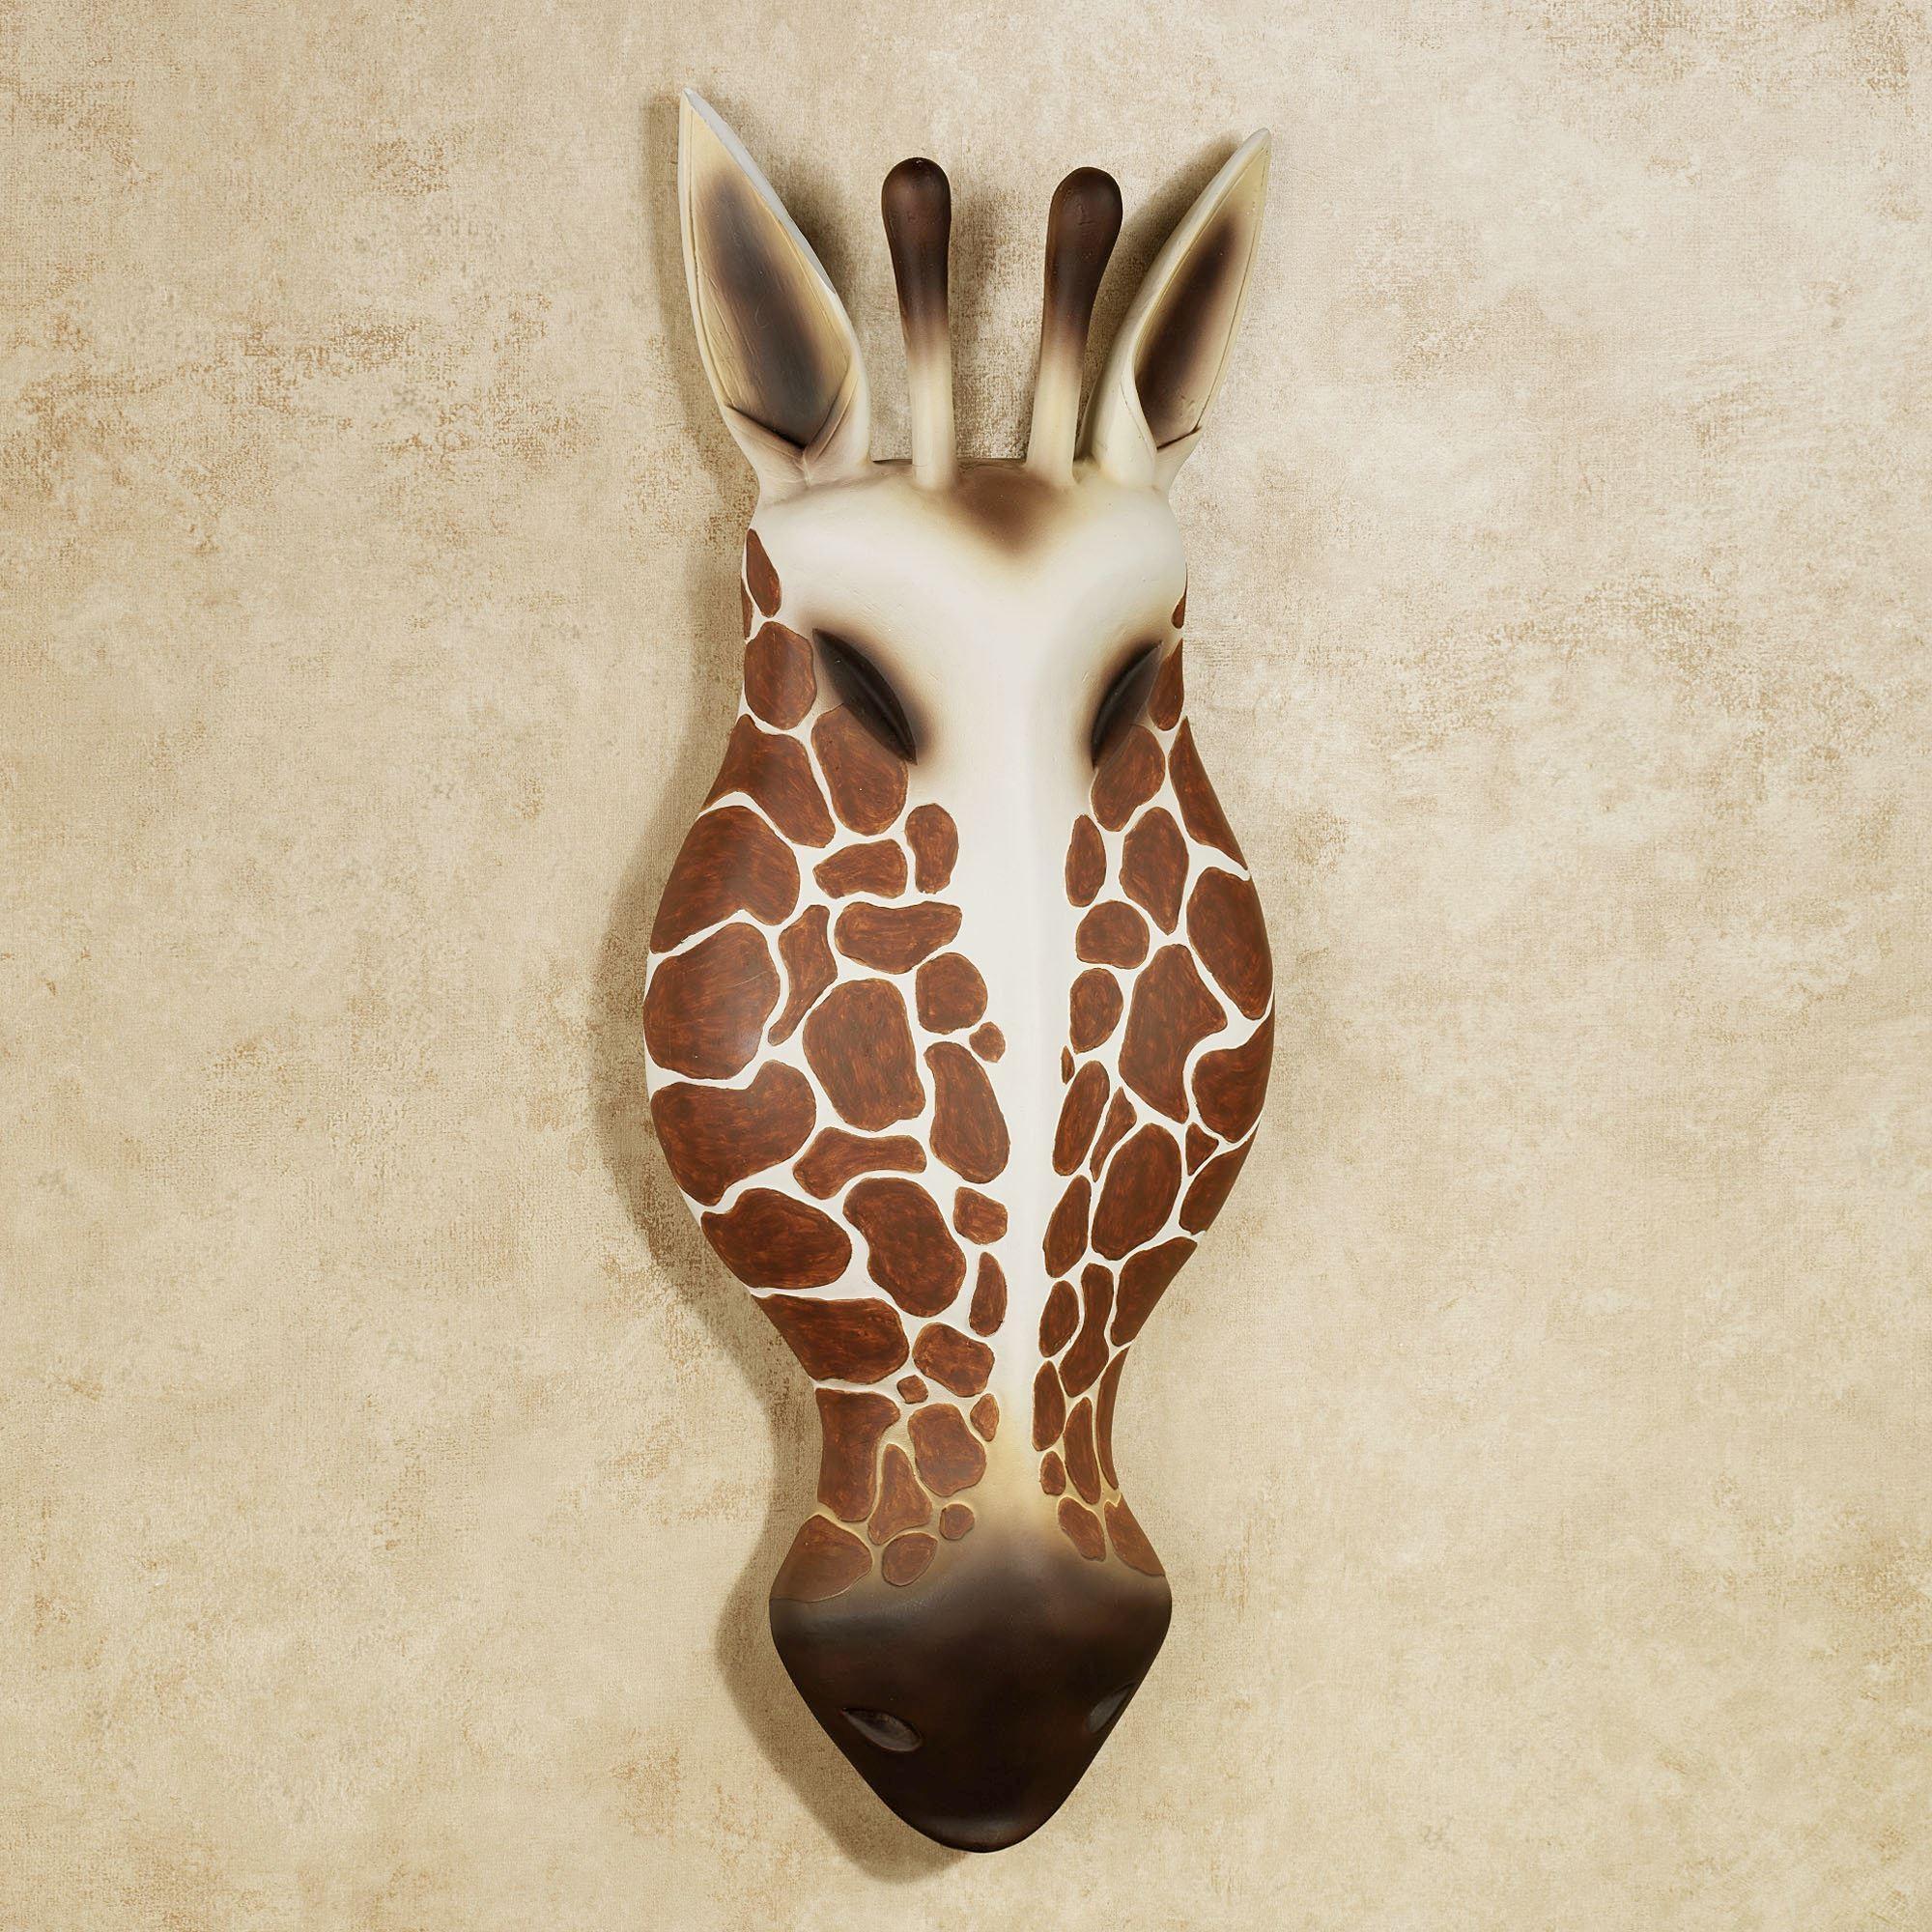 Resin Giraffe Head Wall Art In Auburn Wall Art (Image 20 of 20)